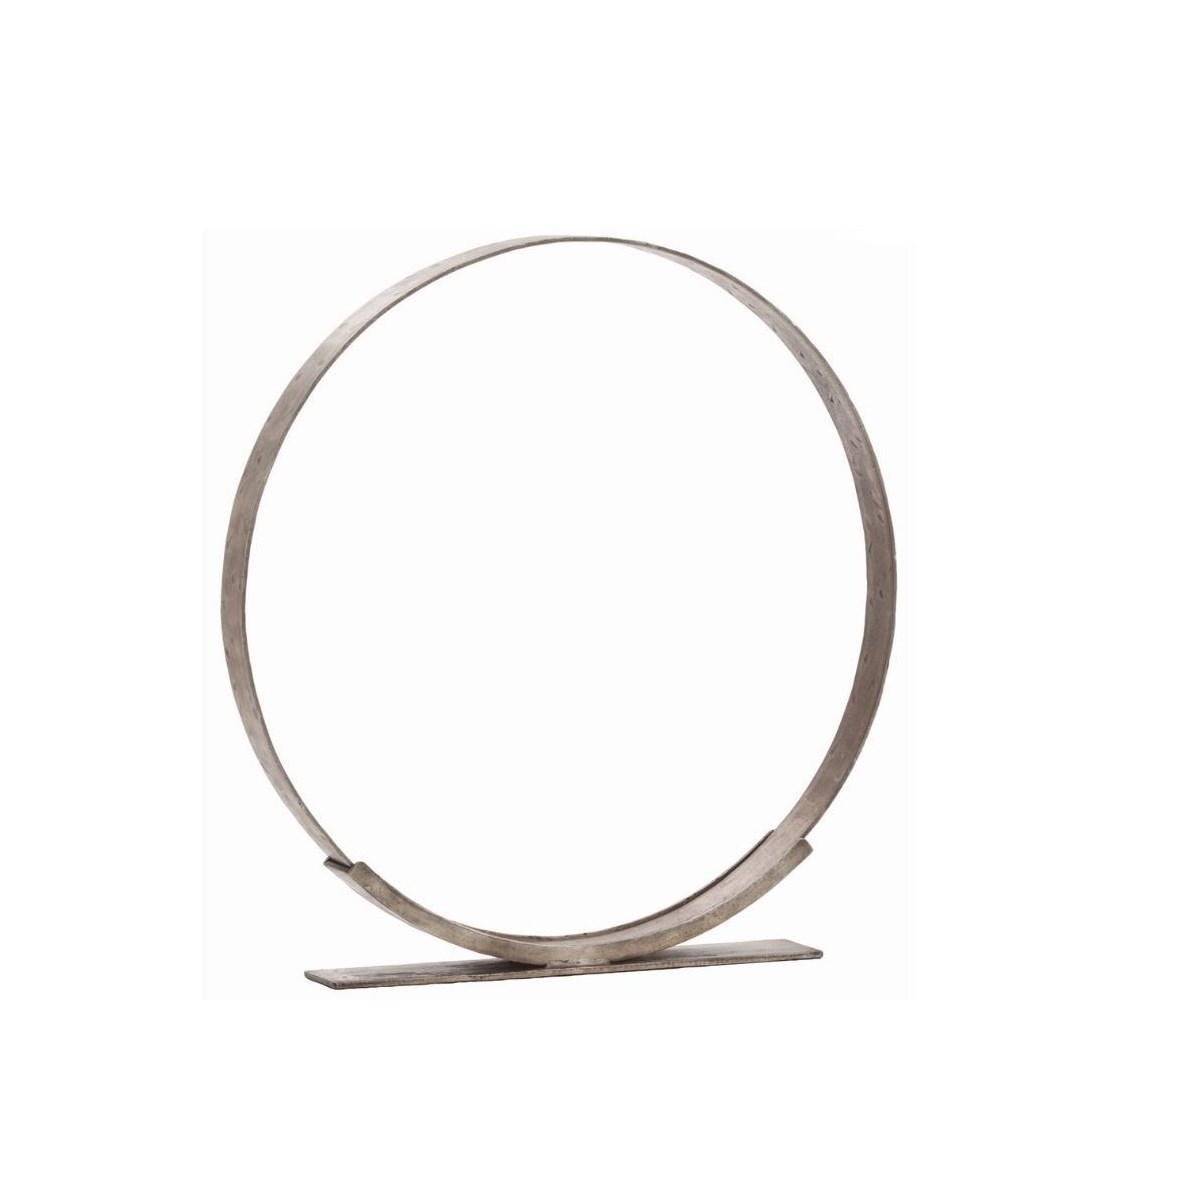 Kobe Small Iron Ring Sculpture